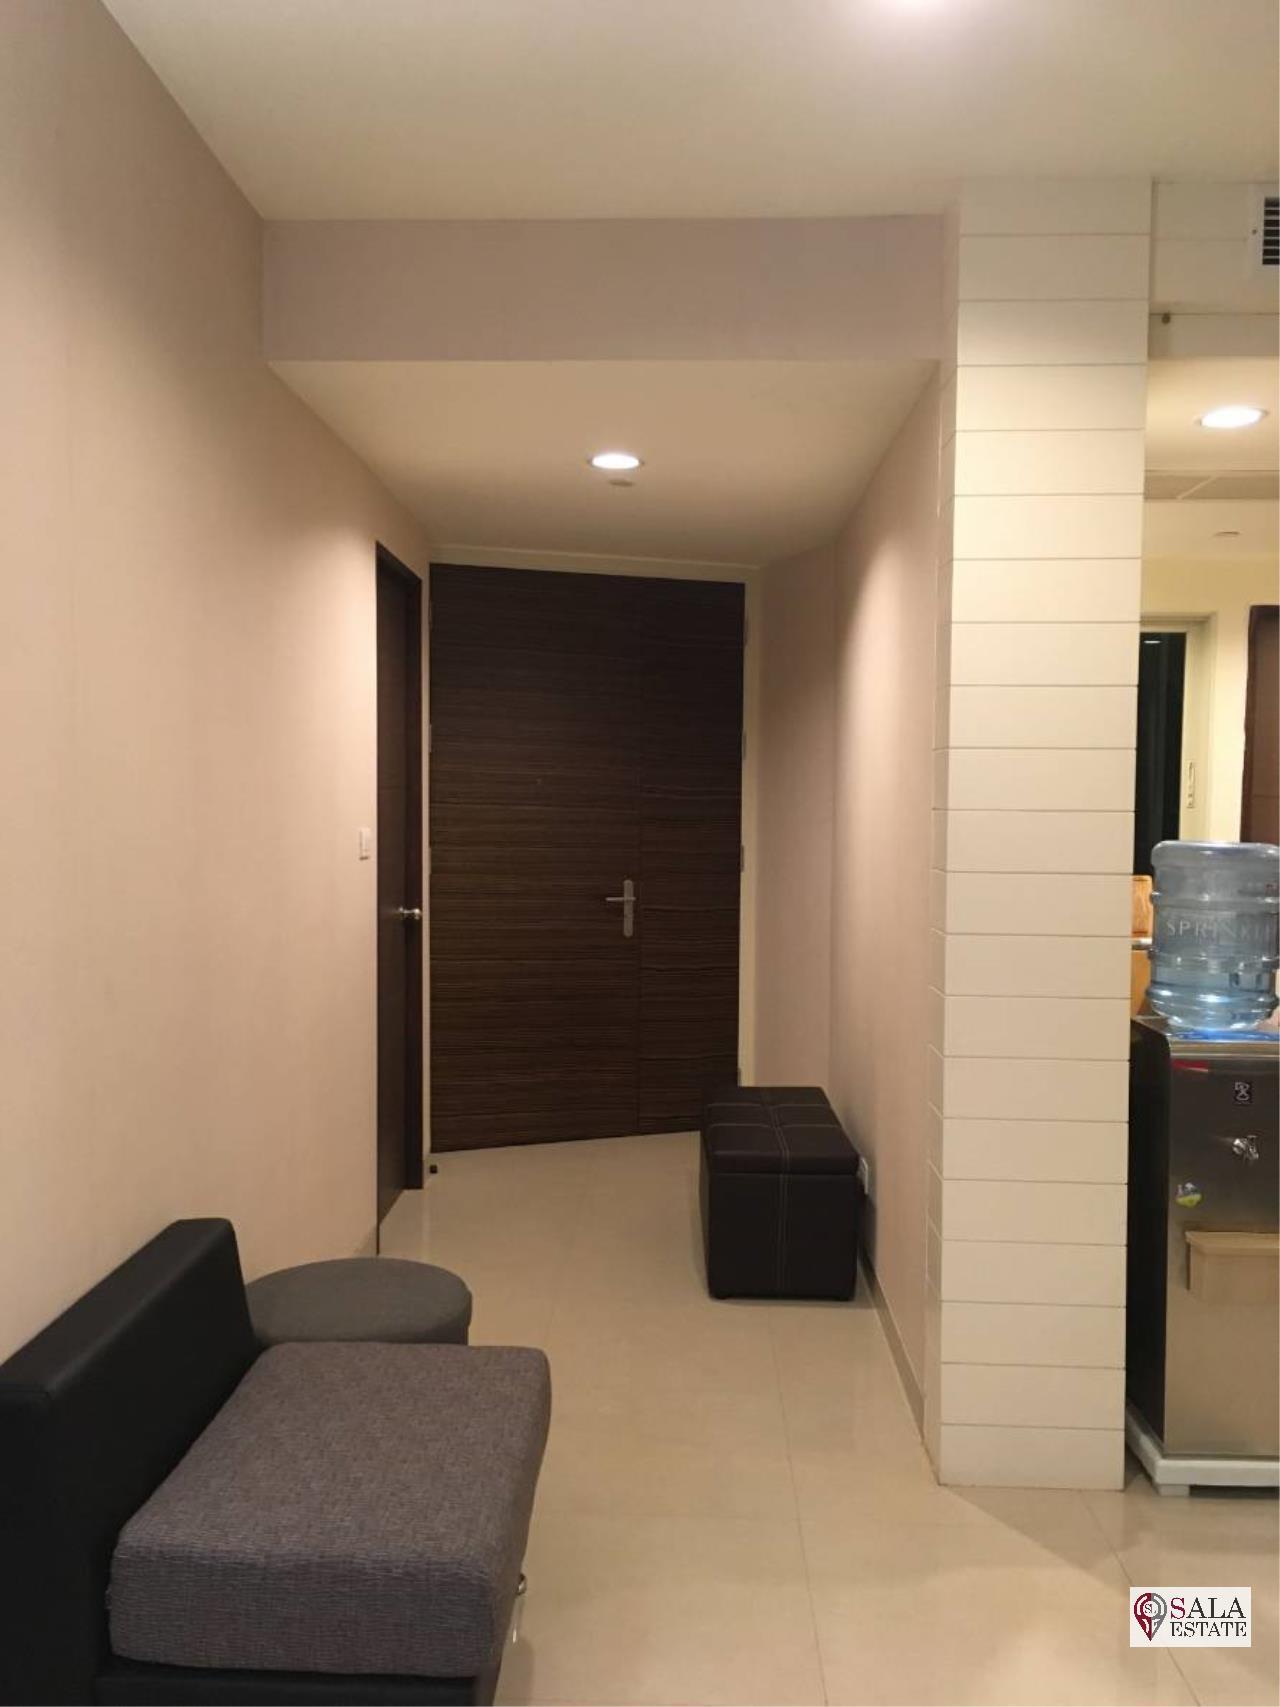 SALA ESTATE Agency's 3 bedroom  condo for sale in Watermark Chaophraya River near BTS Saphan Taksin 6